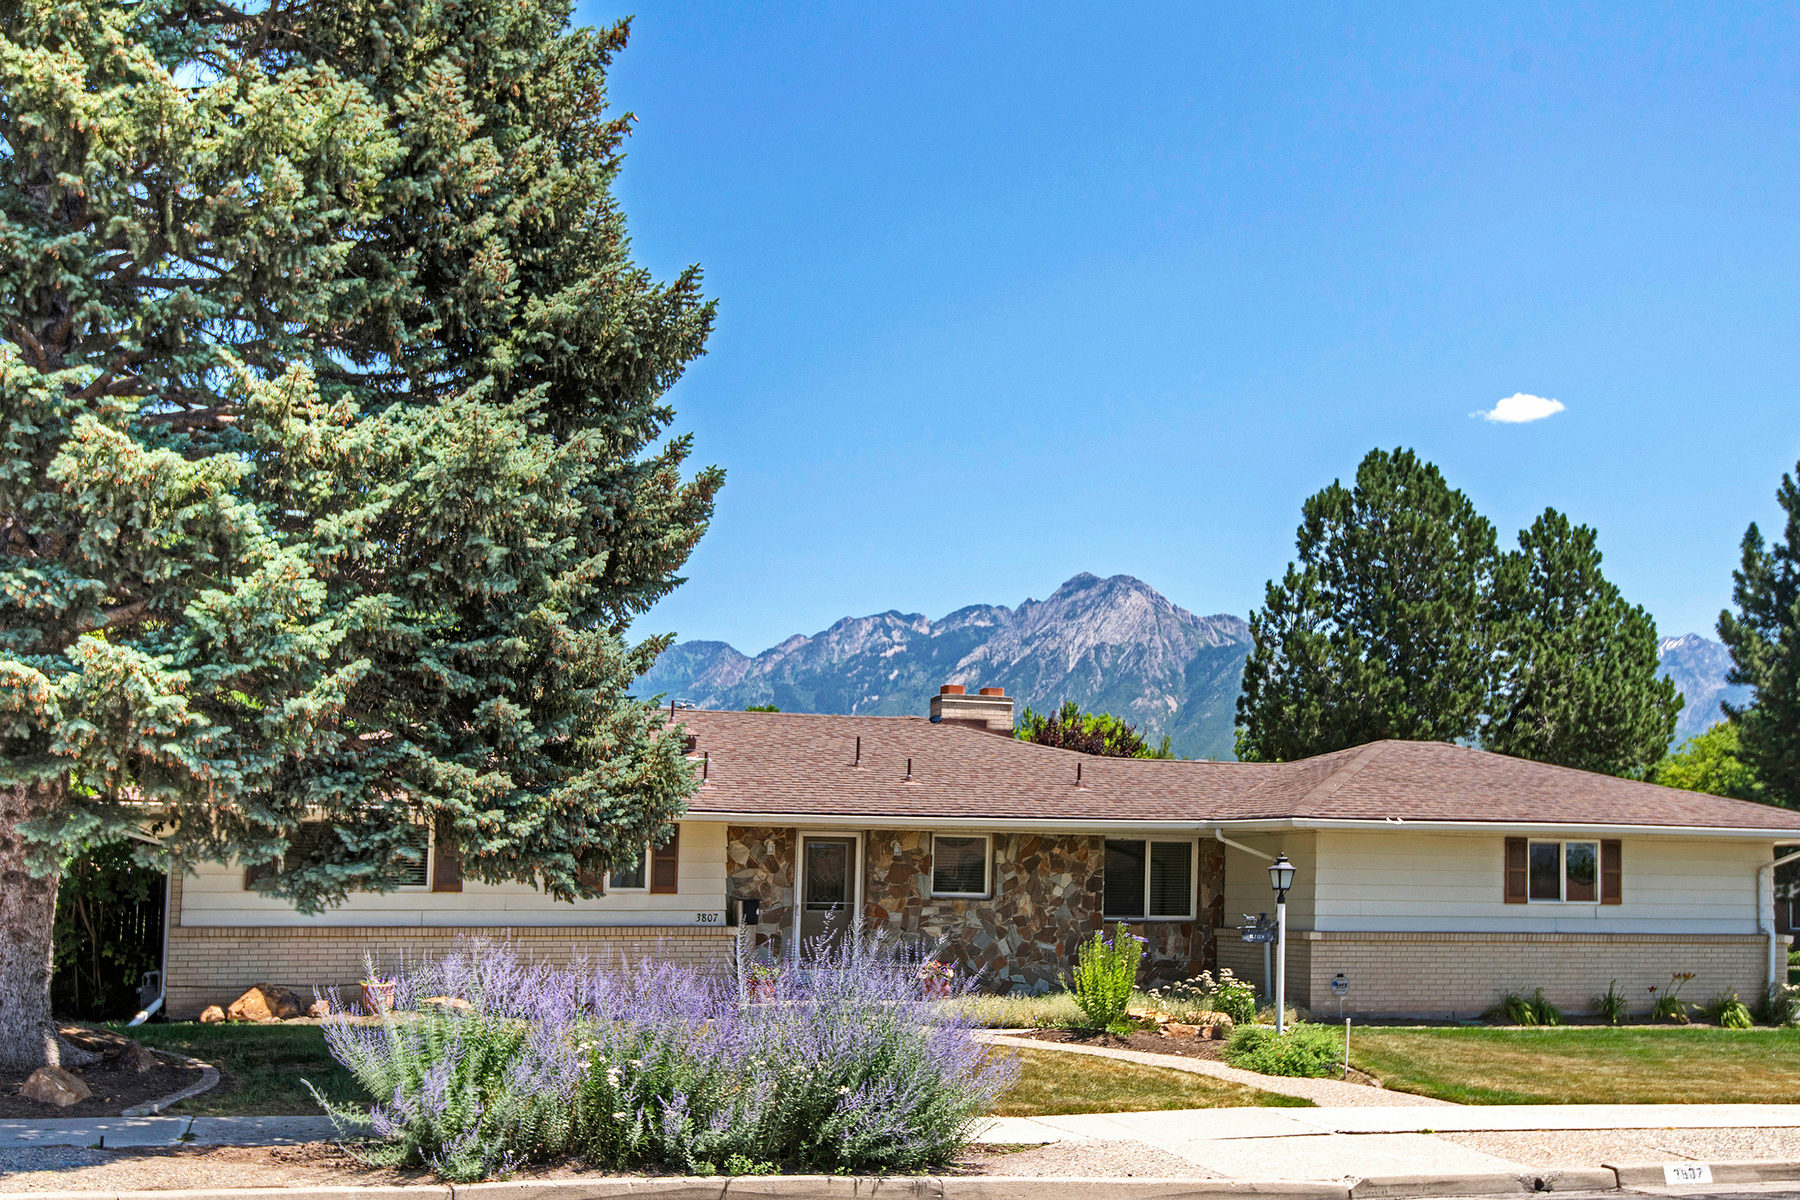 Casa Unifamiliar por un Venta en Gem in the Heart of Salt Lake City 3807 S Alta Loma Dr Salt Lake City, Utah 84106 Estados Unidos